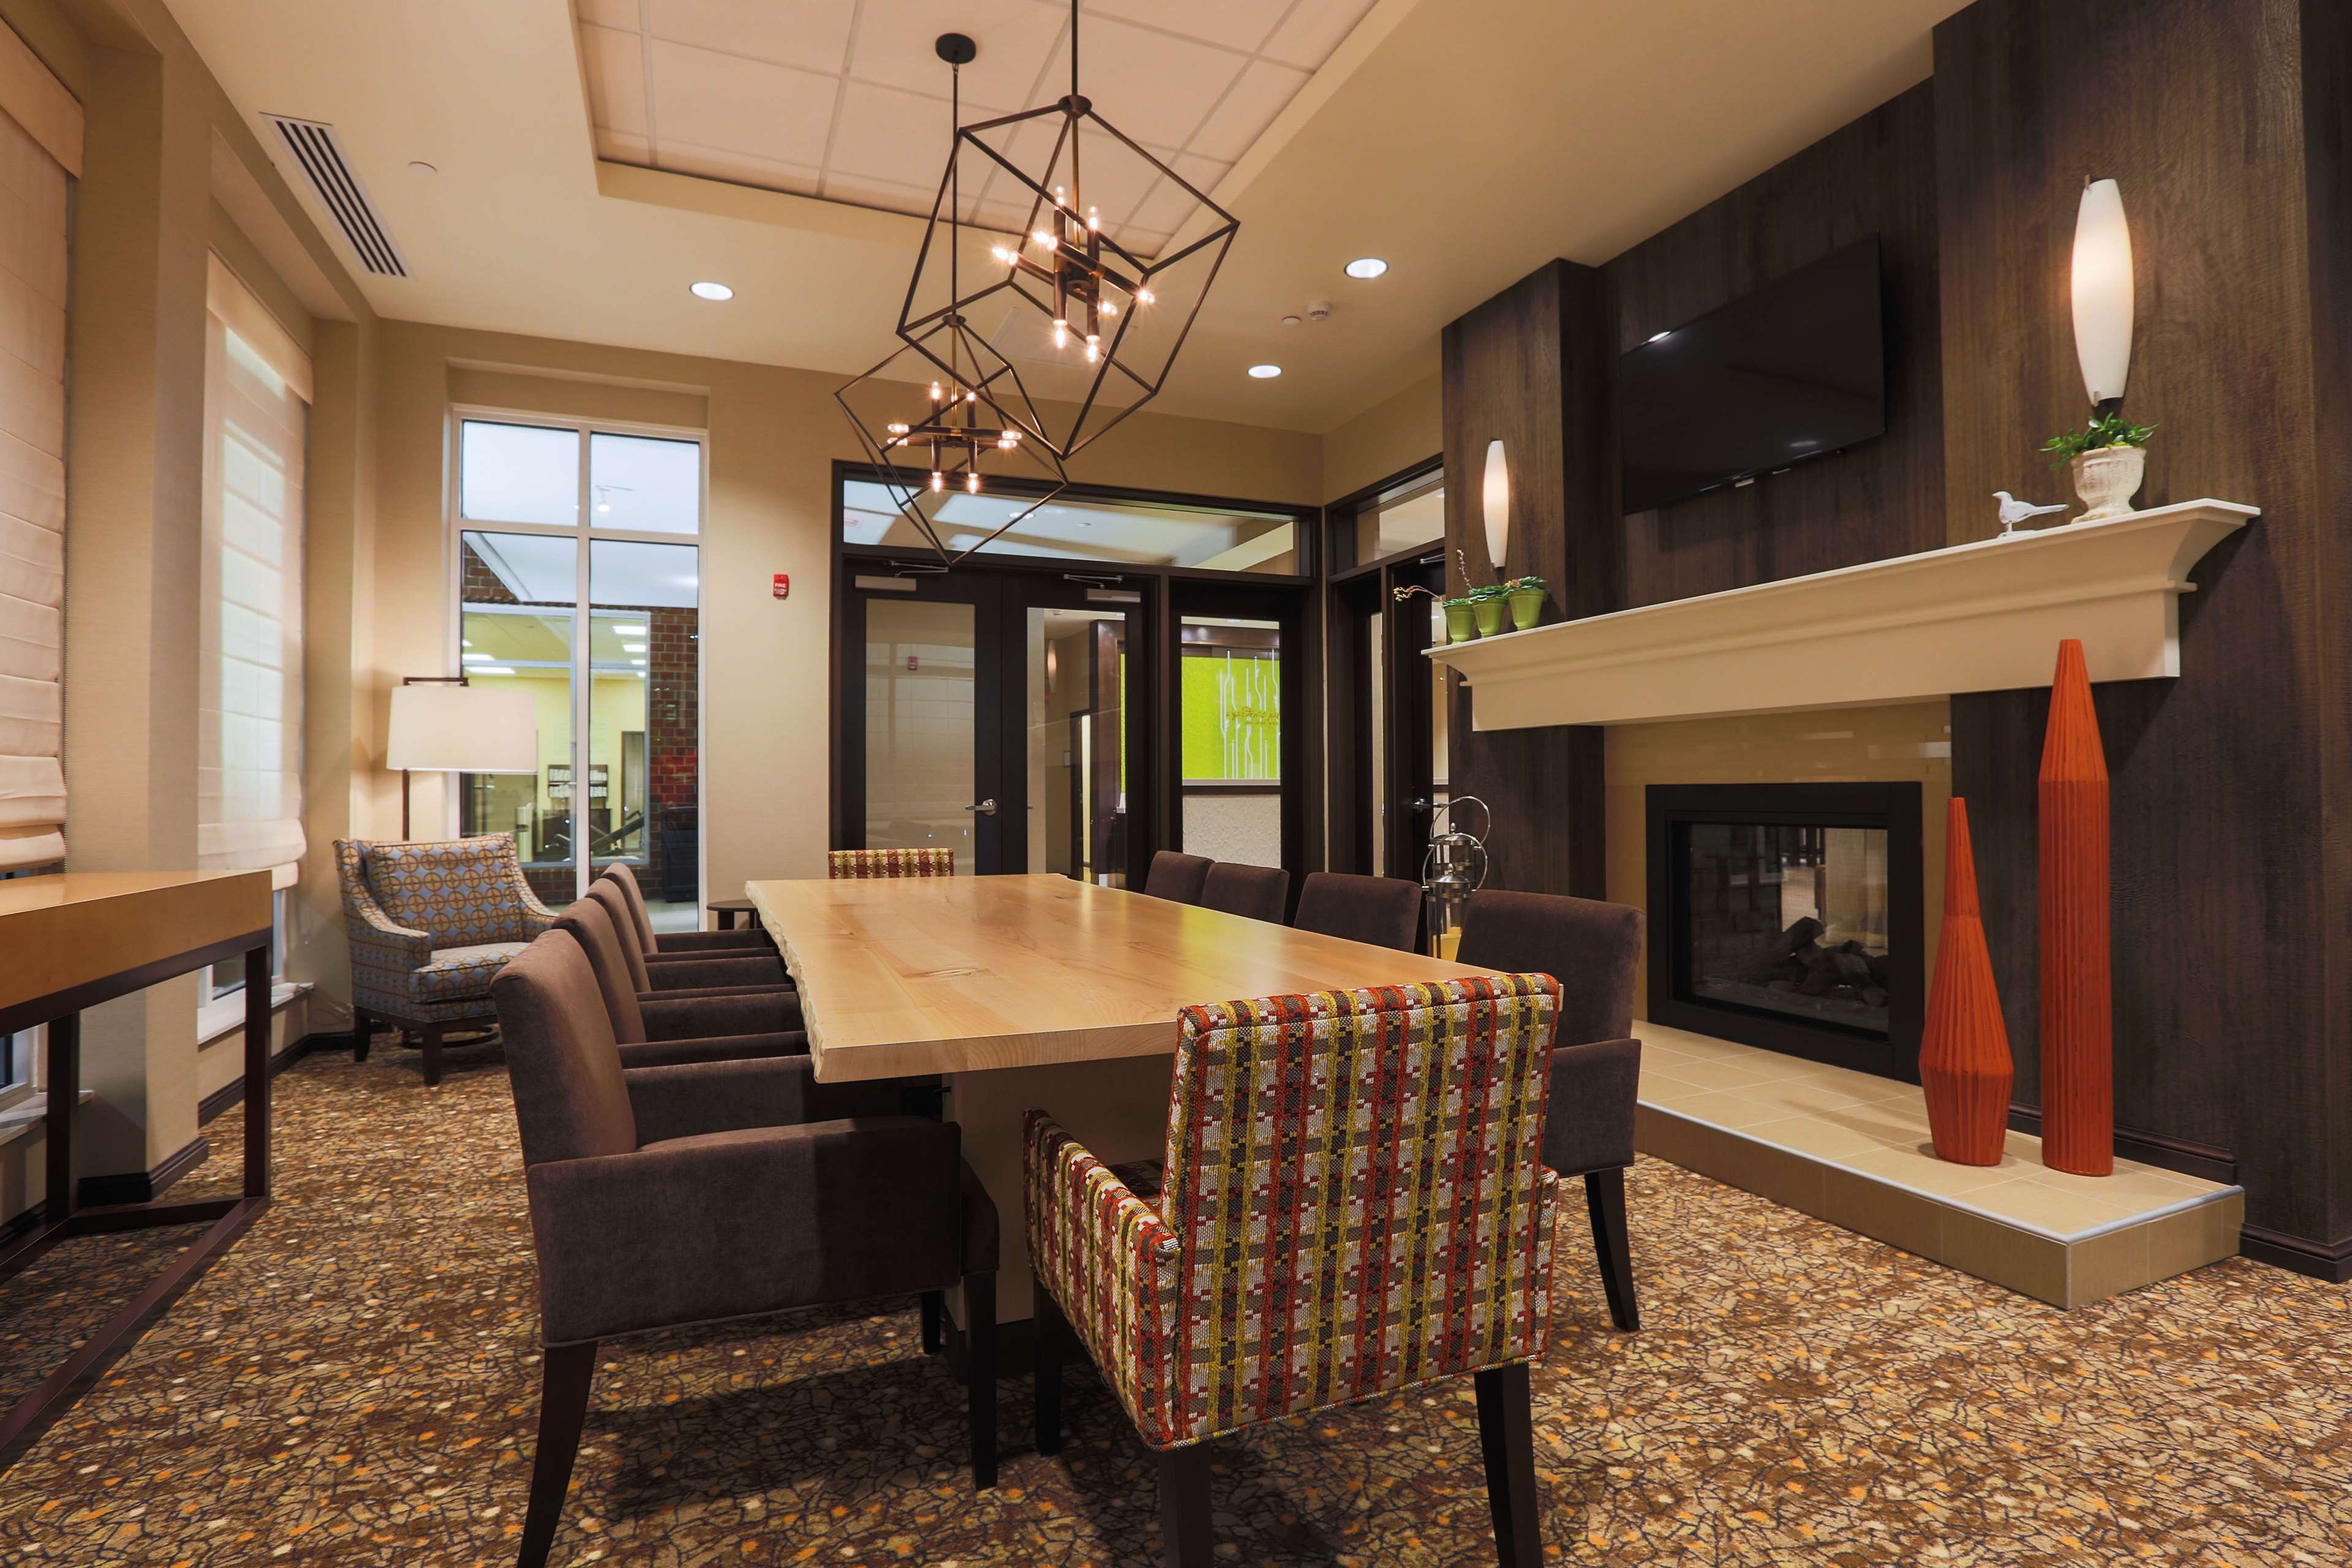 Hilton Garden Inn Indiana at IUP image 21